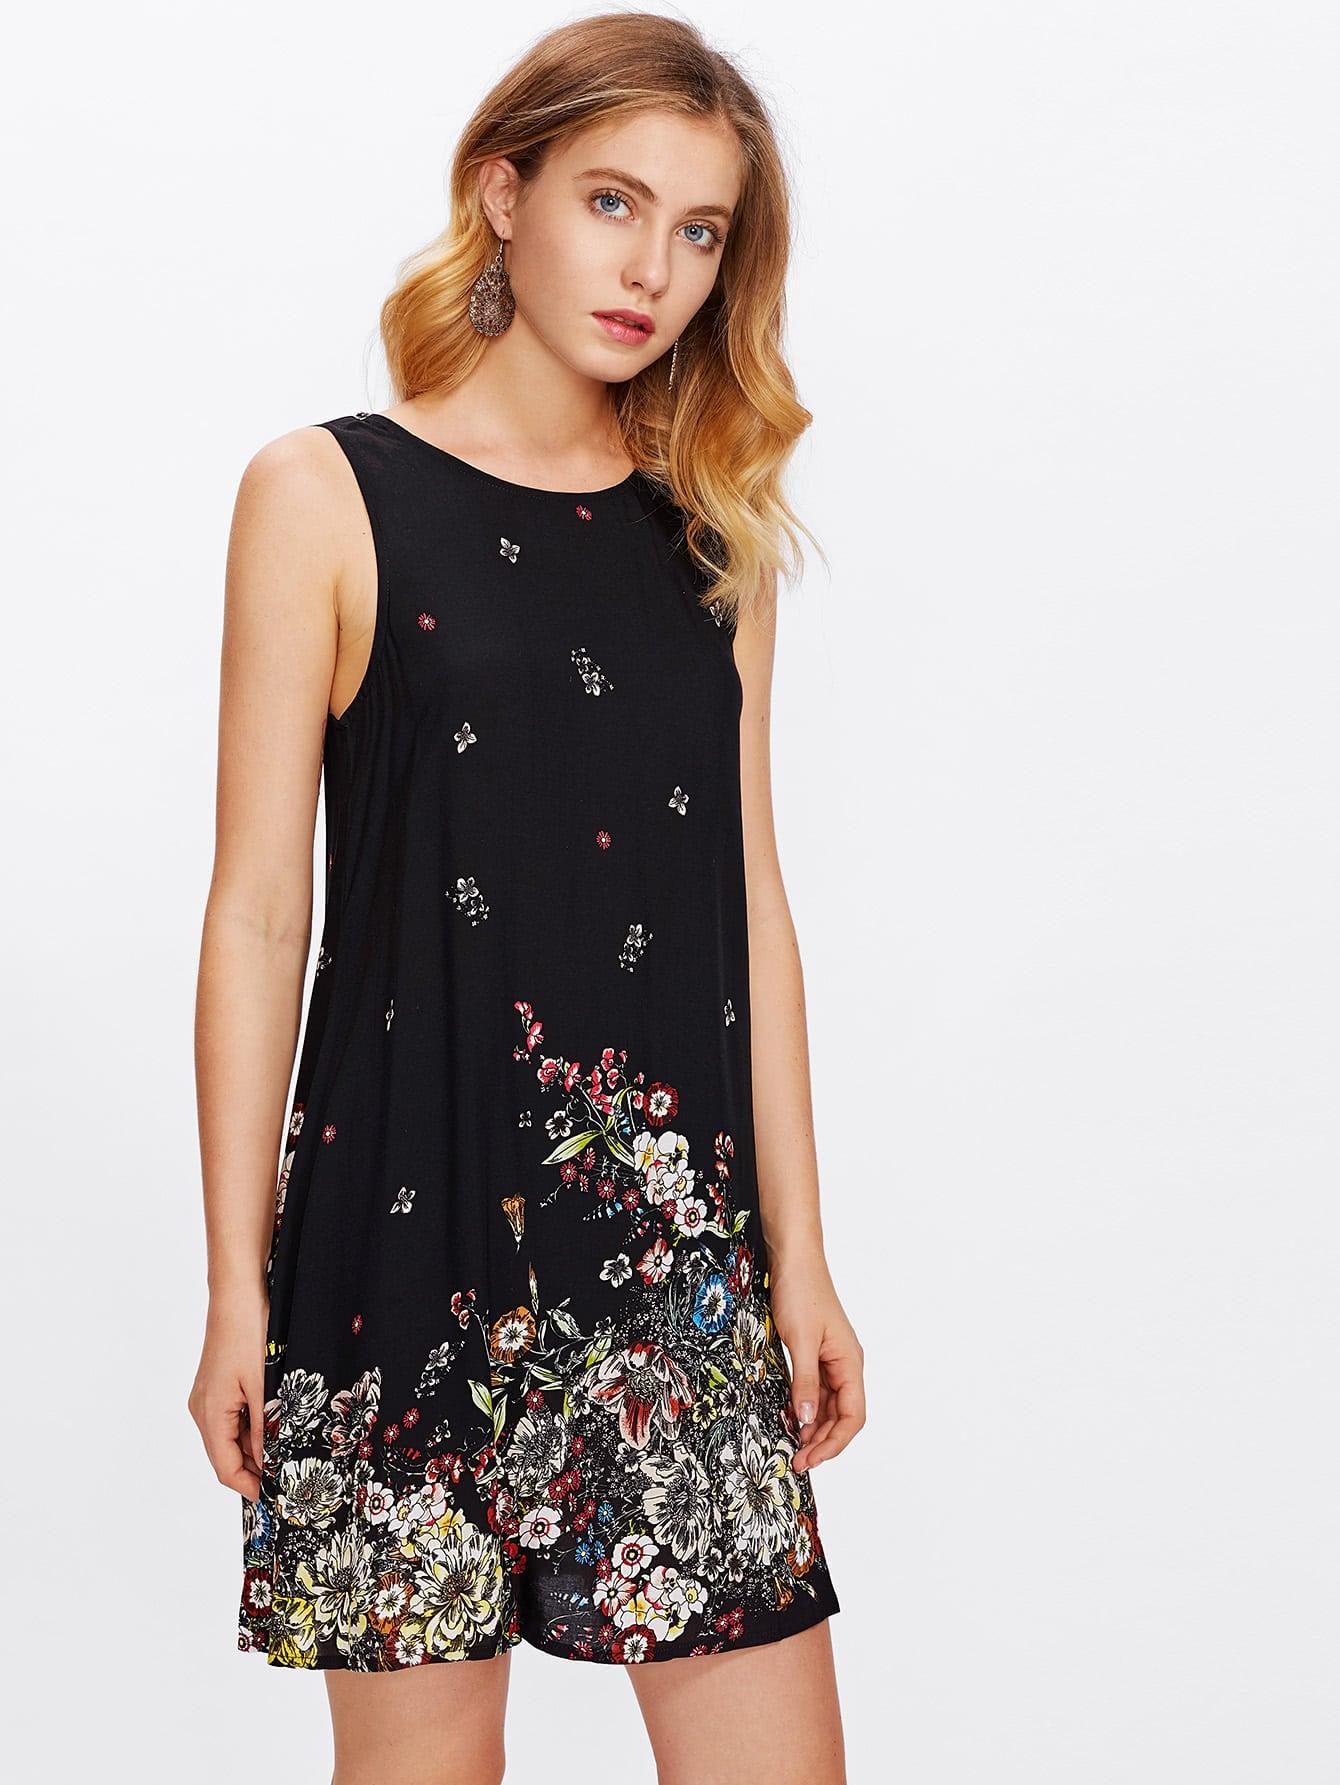 Botanical Print Tank Dress scalloped edge botanical print dress